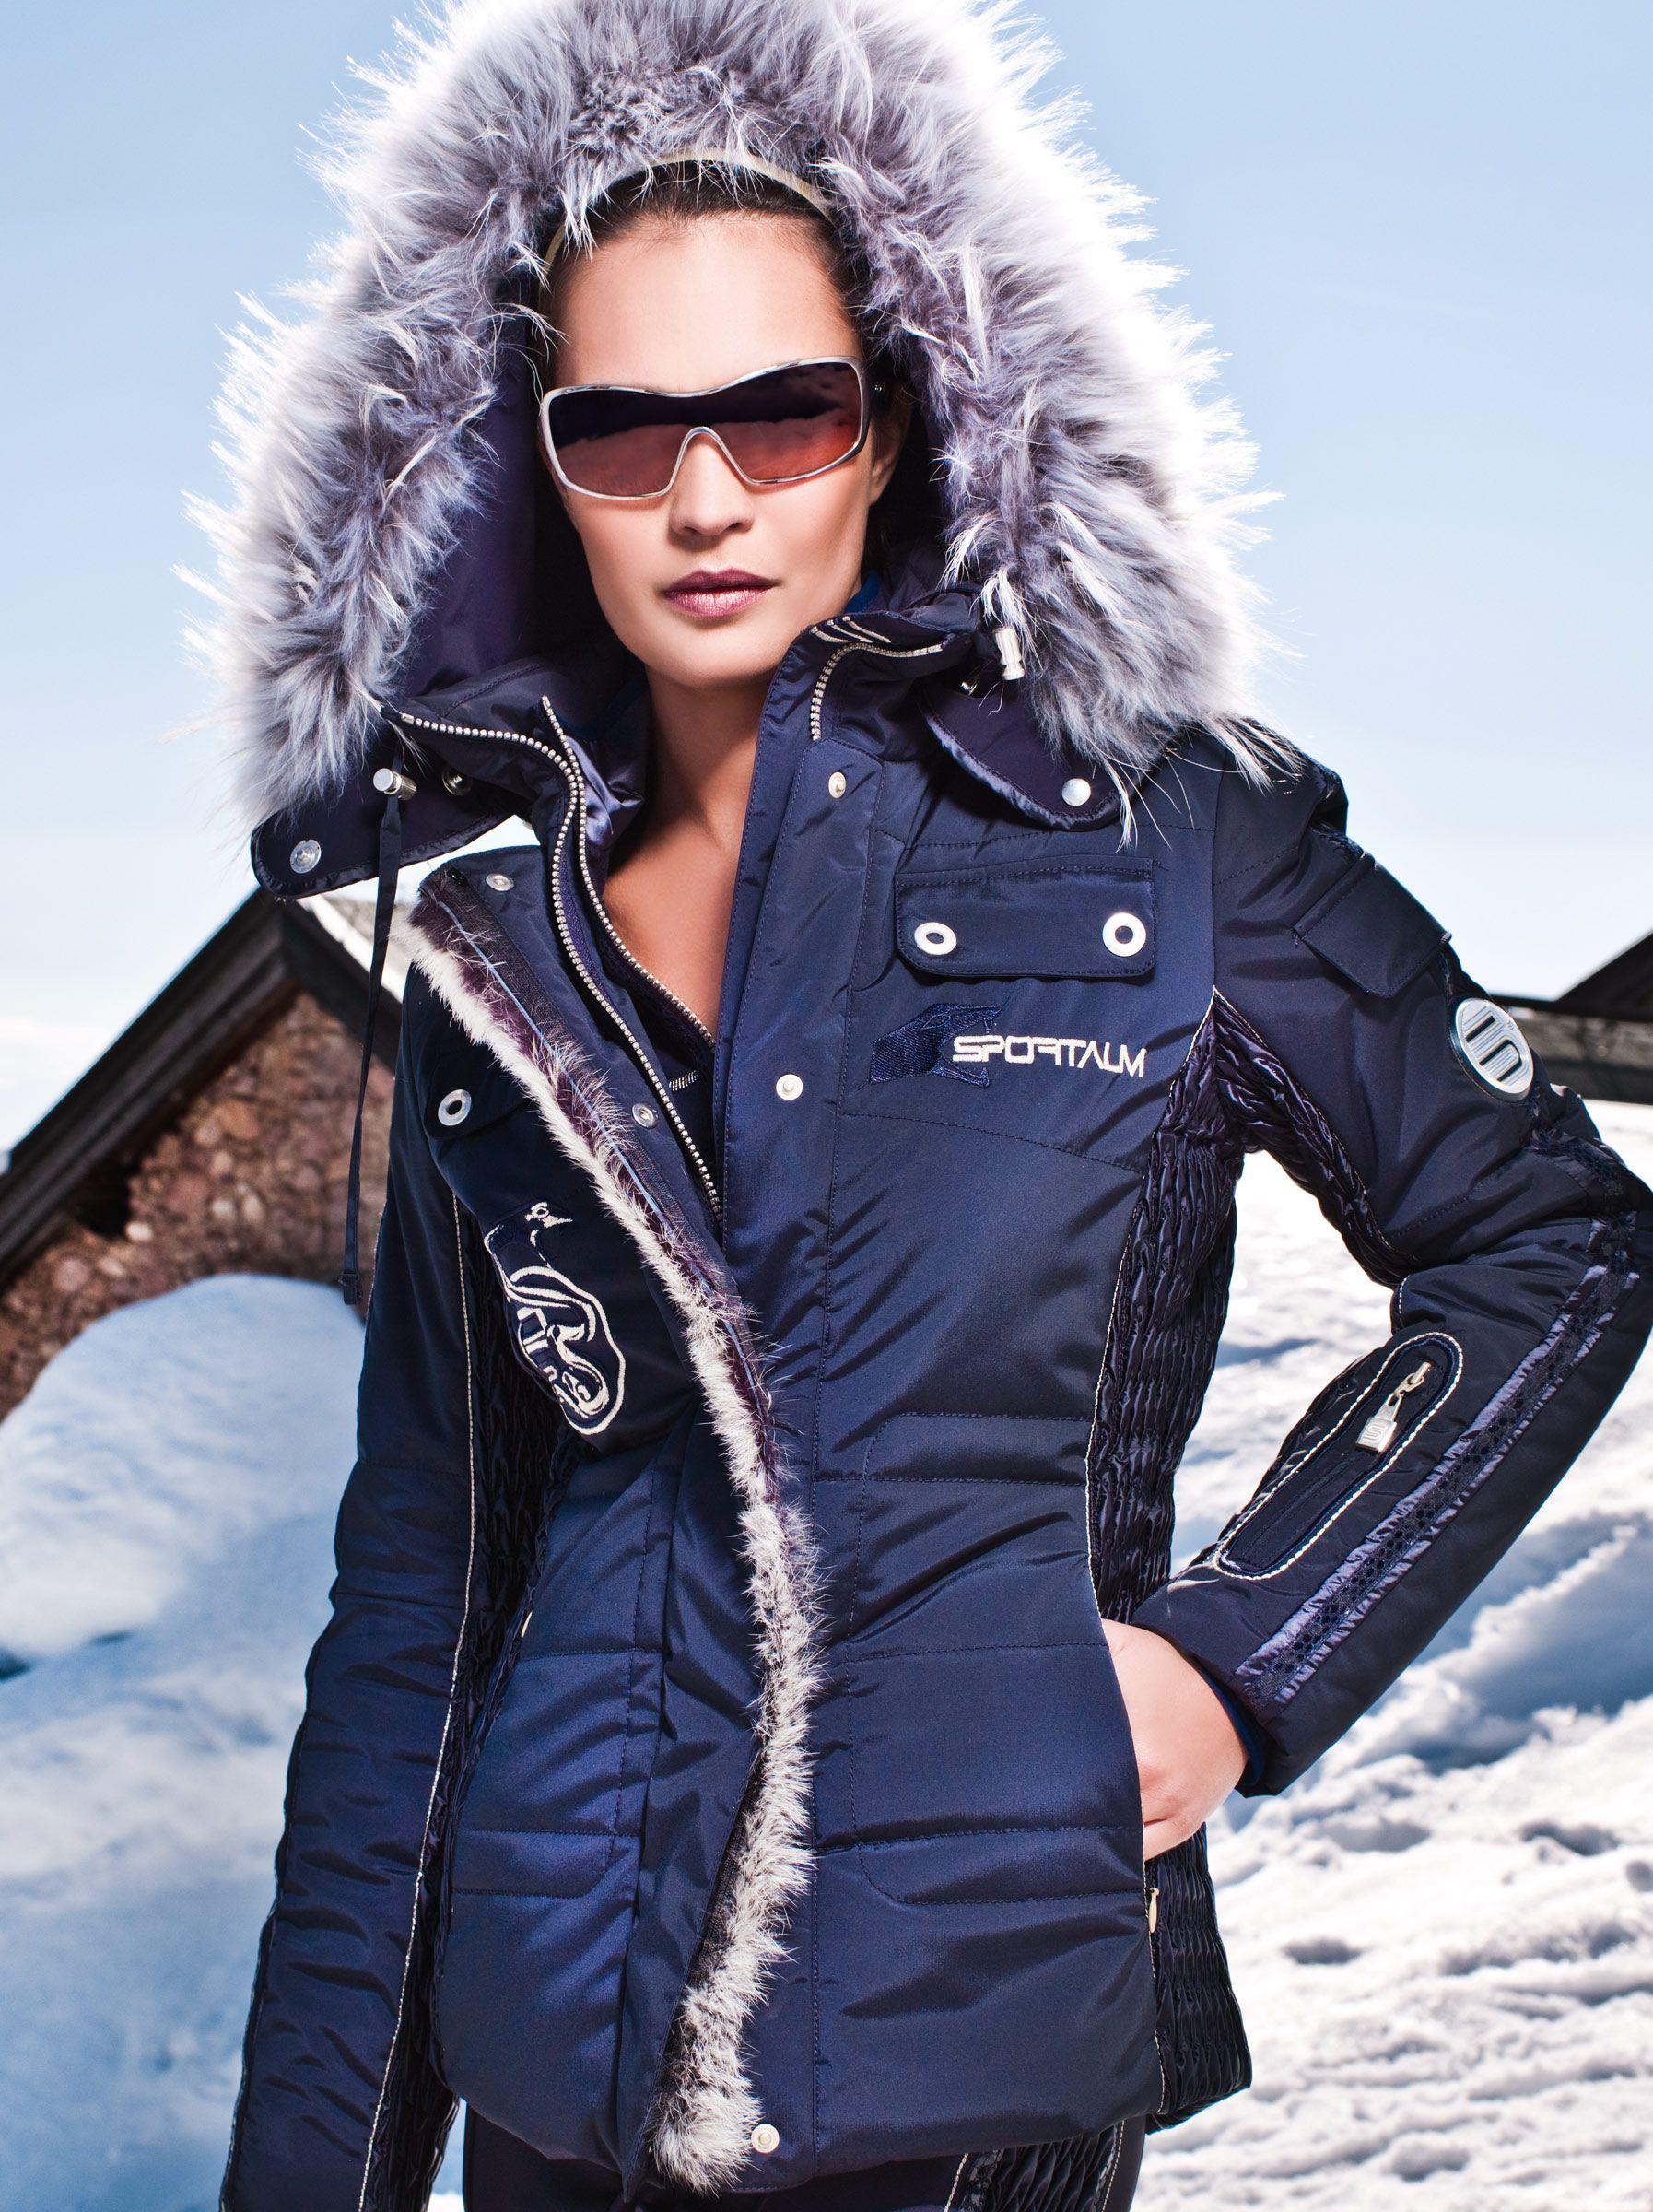 SPORTALM STEEL JACKET  Ski Clothing 56d45c4e6